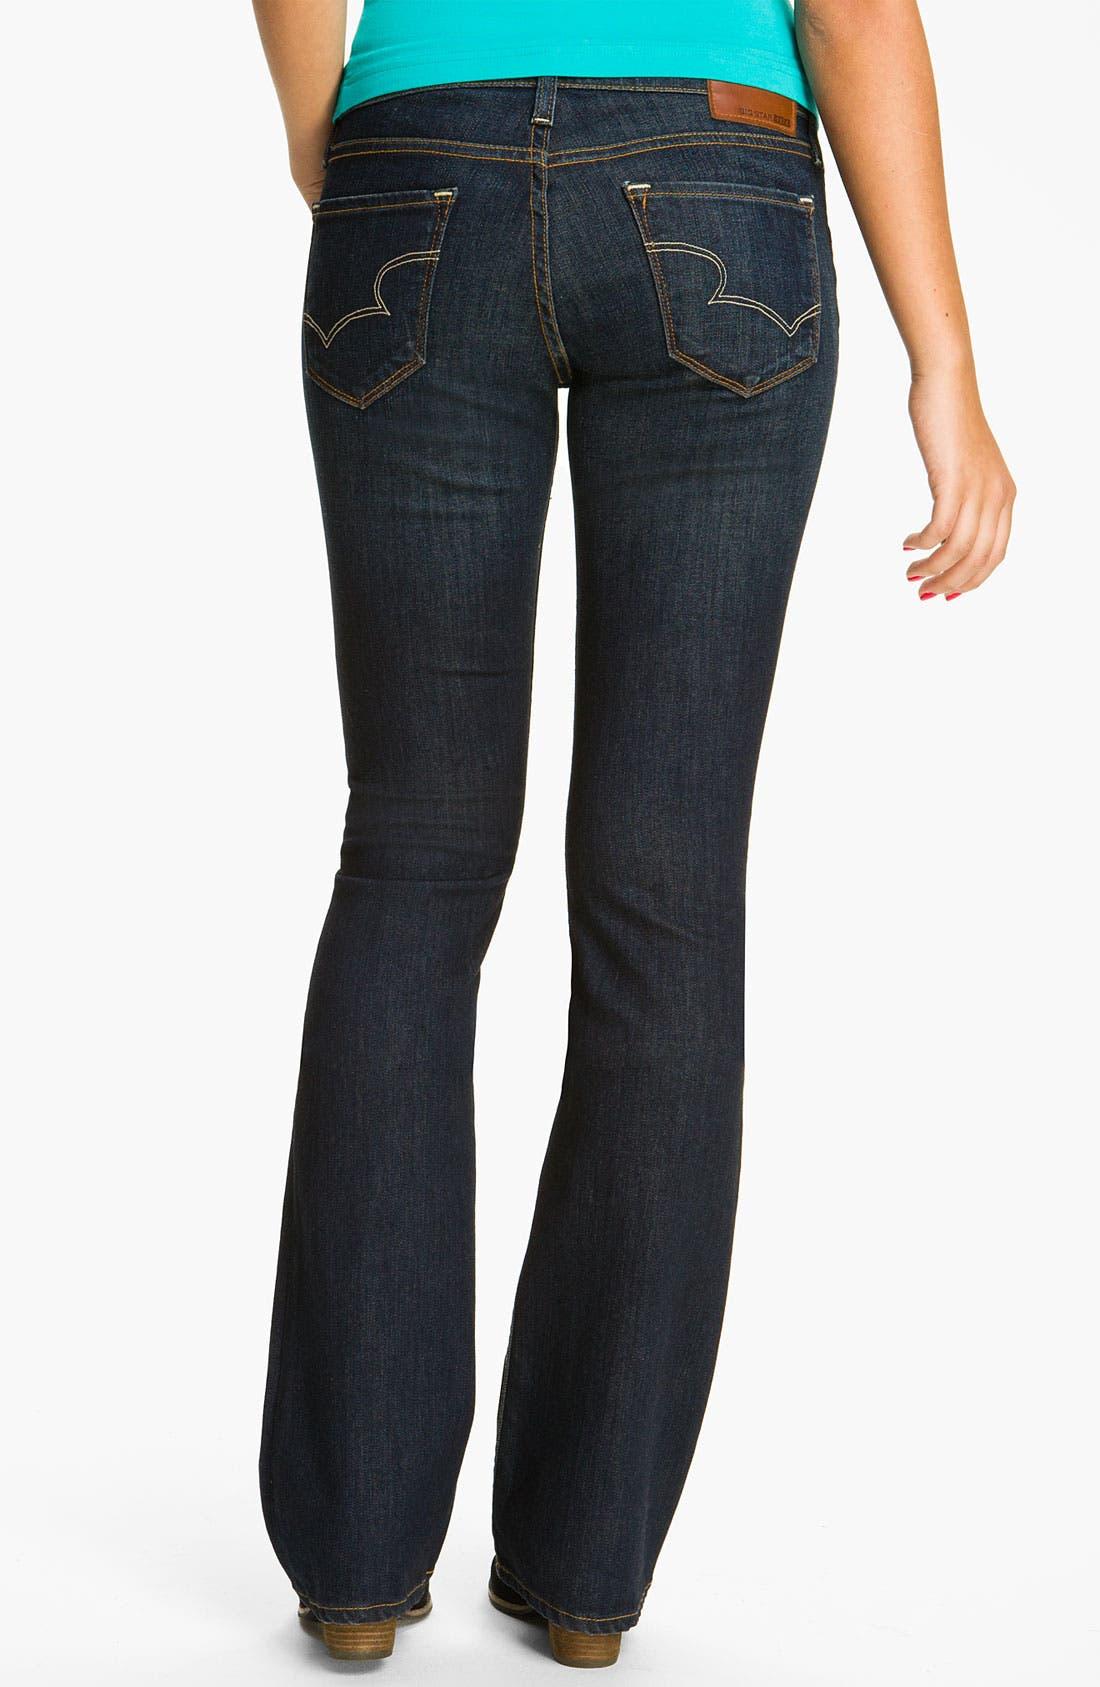 Alternate Image 2  - Big Star 'Hazel' Slim Bootcut Jeans (Three Year Dust) (Juniors)